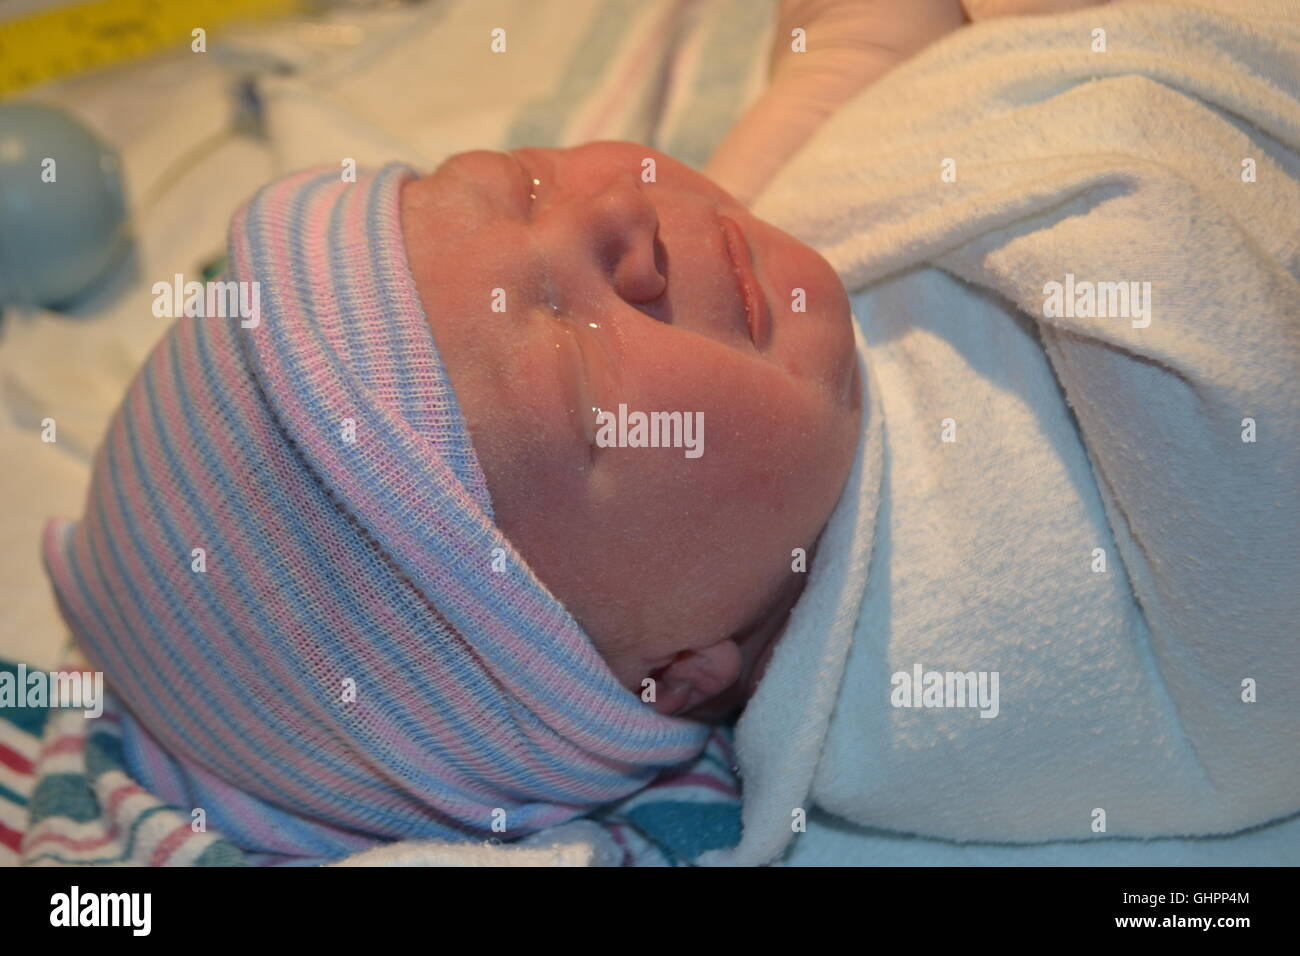 Gel in new born baby eyes - Stock Image